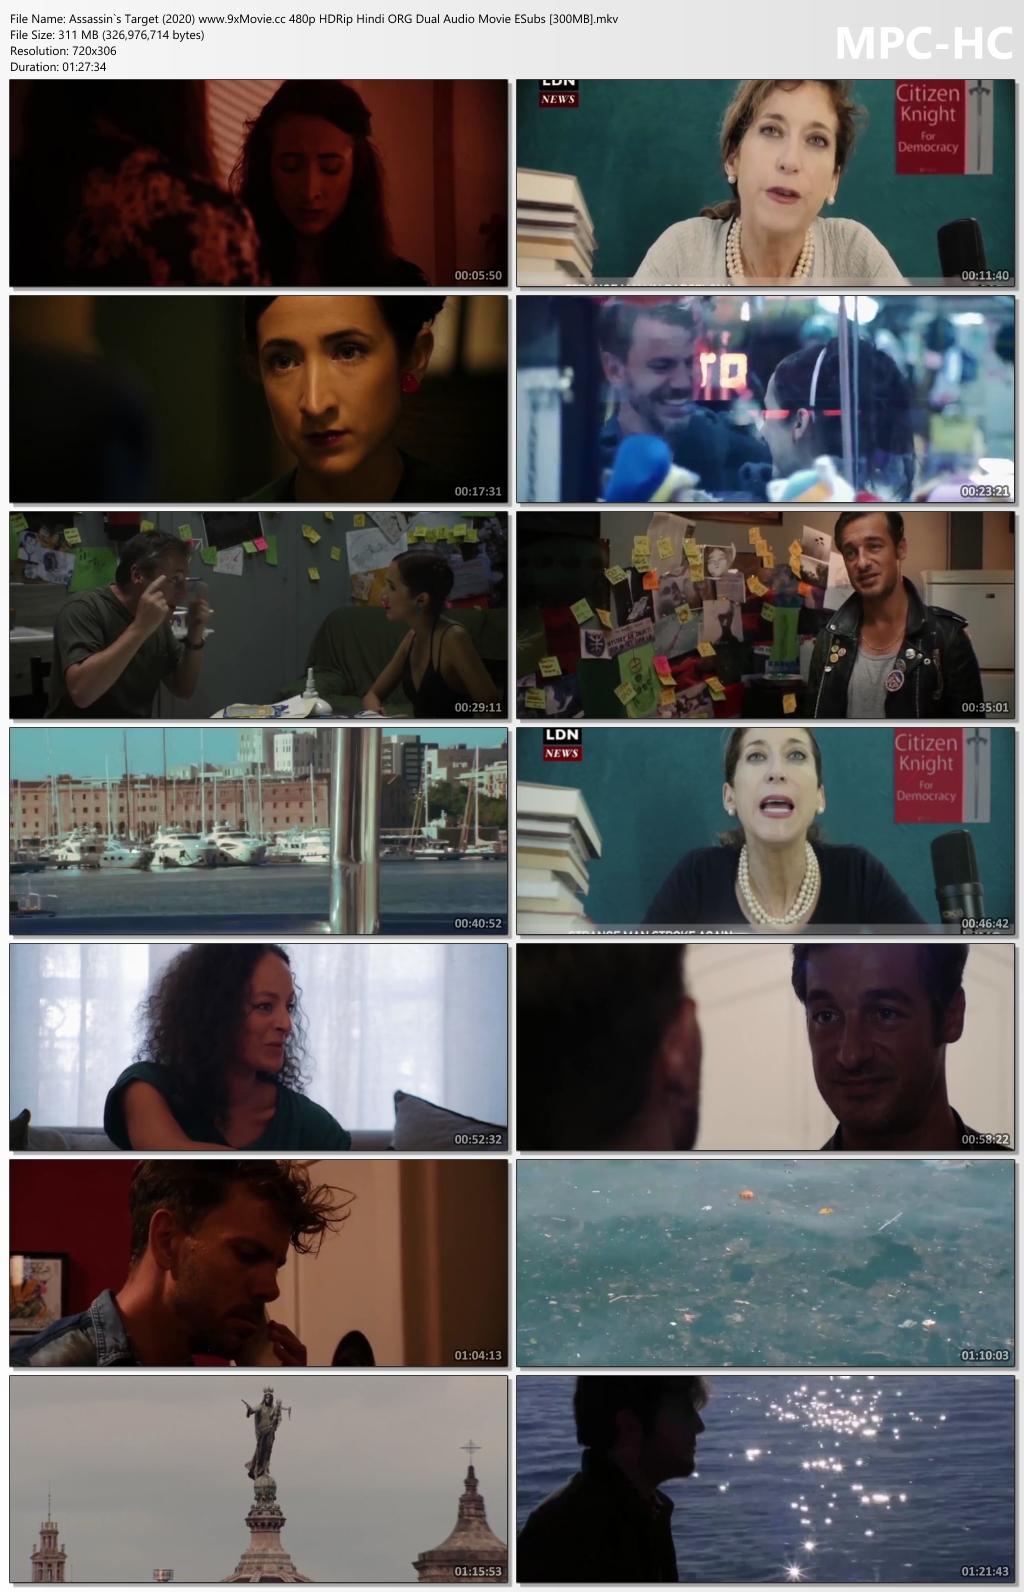 Assassin-s-Target-2020-www-9x-Movie-cc-480p-HDRip-Hindi-ORG-Dual-Audio-Movie-ESubs-300-MB-mkv